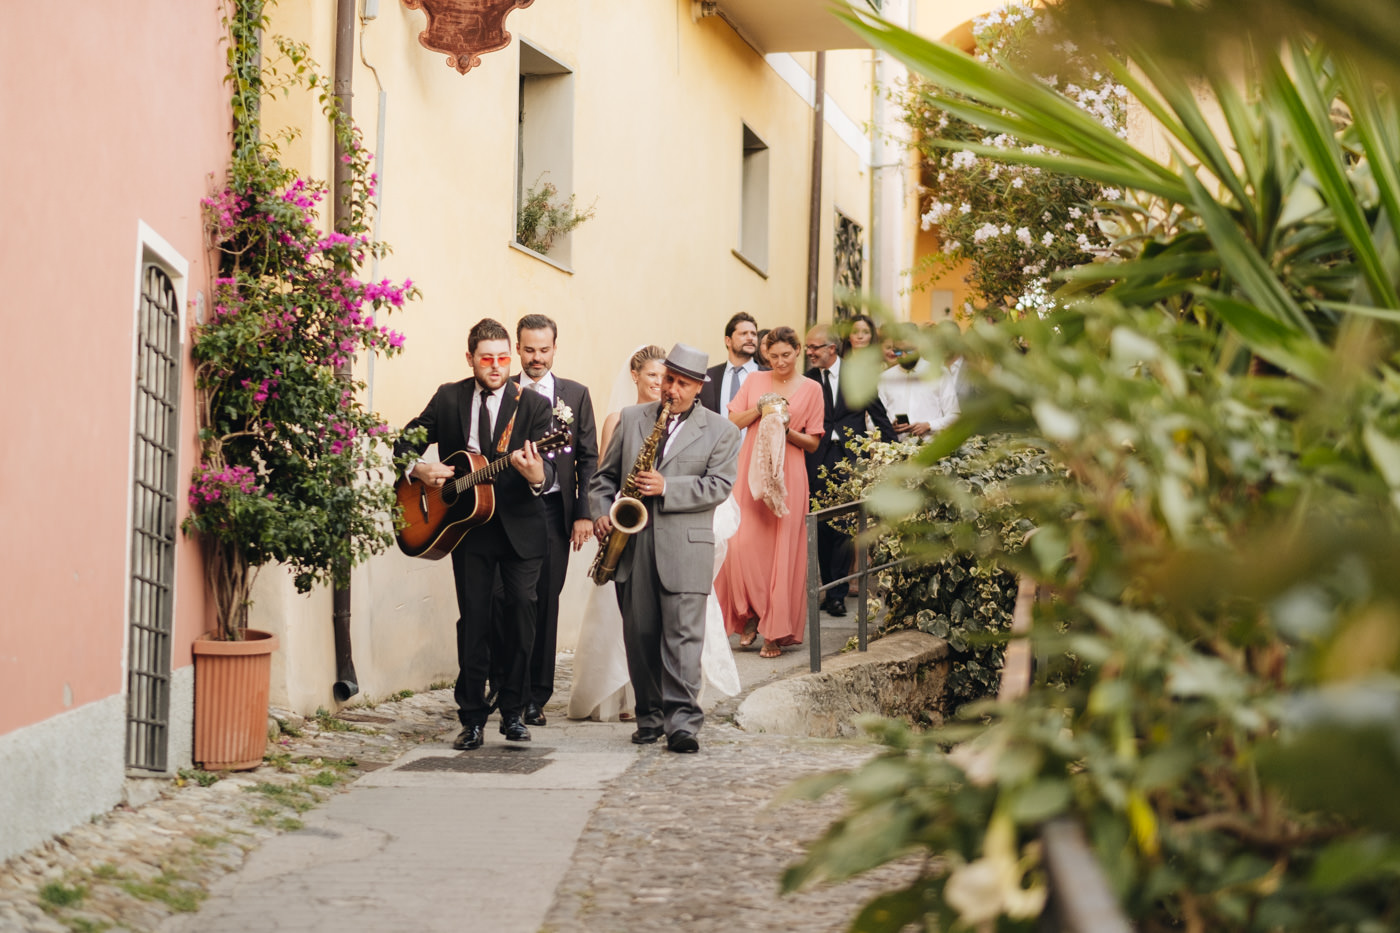 matrimoni_all_italiana_fotografo_matrimonio_cinque_terre-59.jpg